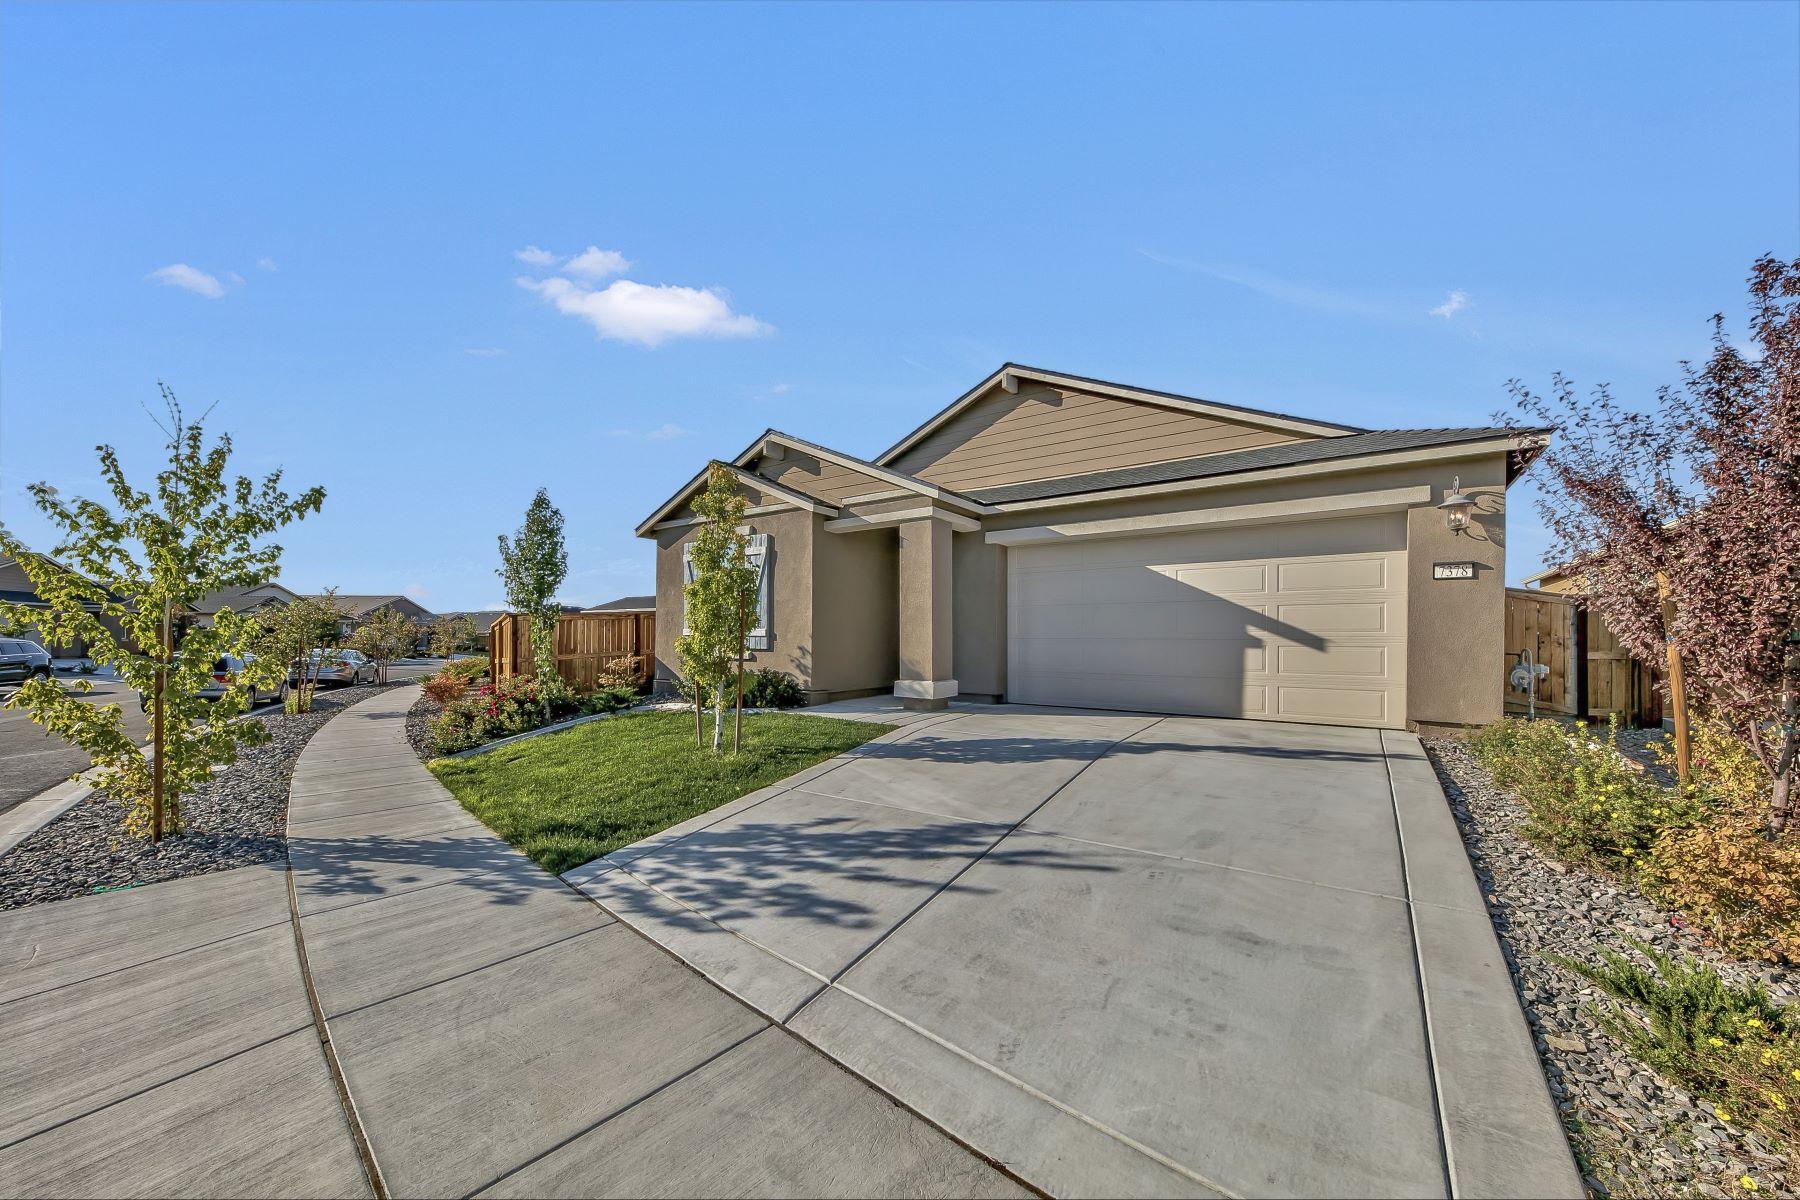 Single Family Homes 为 销售 在 Better Than New One Level Living 7378 Overture Dr 里诺, 内华达州 89506 美国